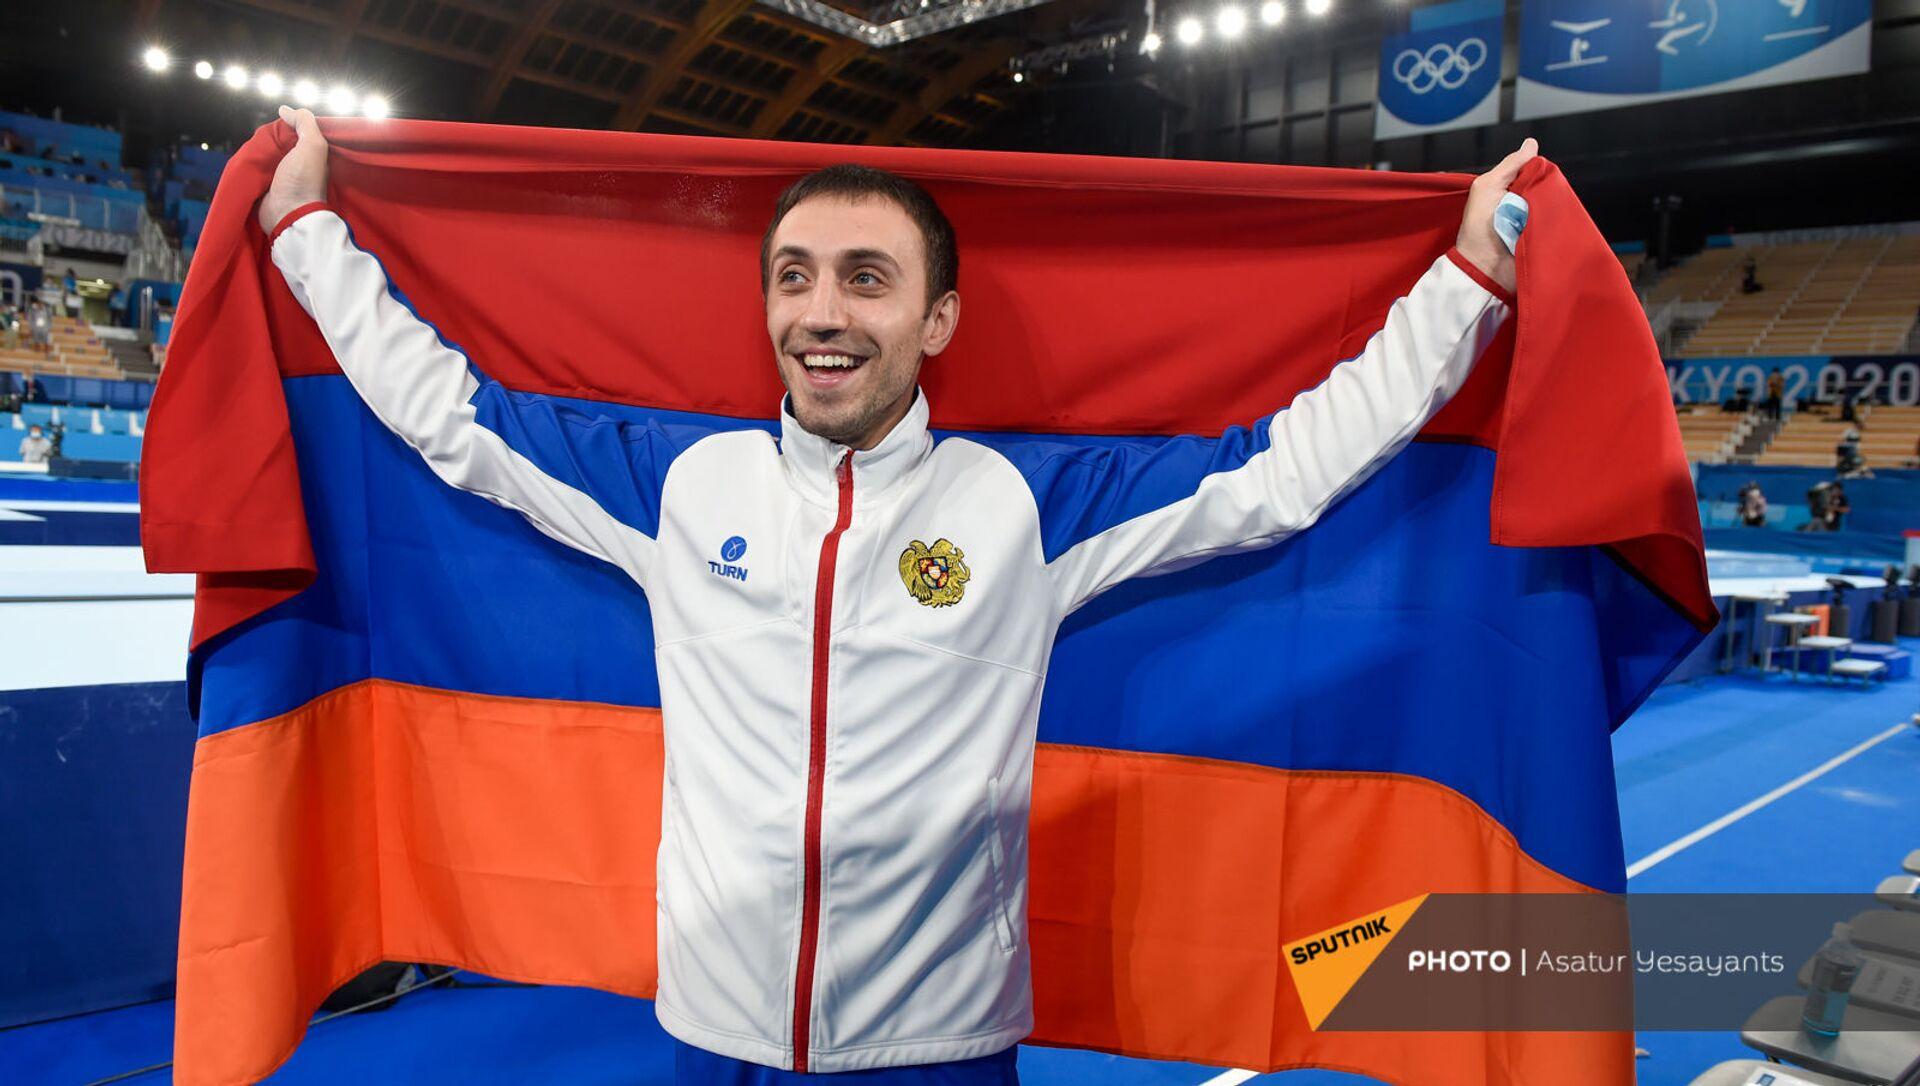 Гимнаст Артур Давтян празднует победу на XXXII летних Олимпийских играх (2 августа 2021). Токио - Sputnik Արմենիա, 1920, 02.08.2021